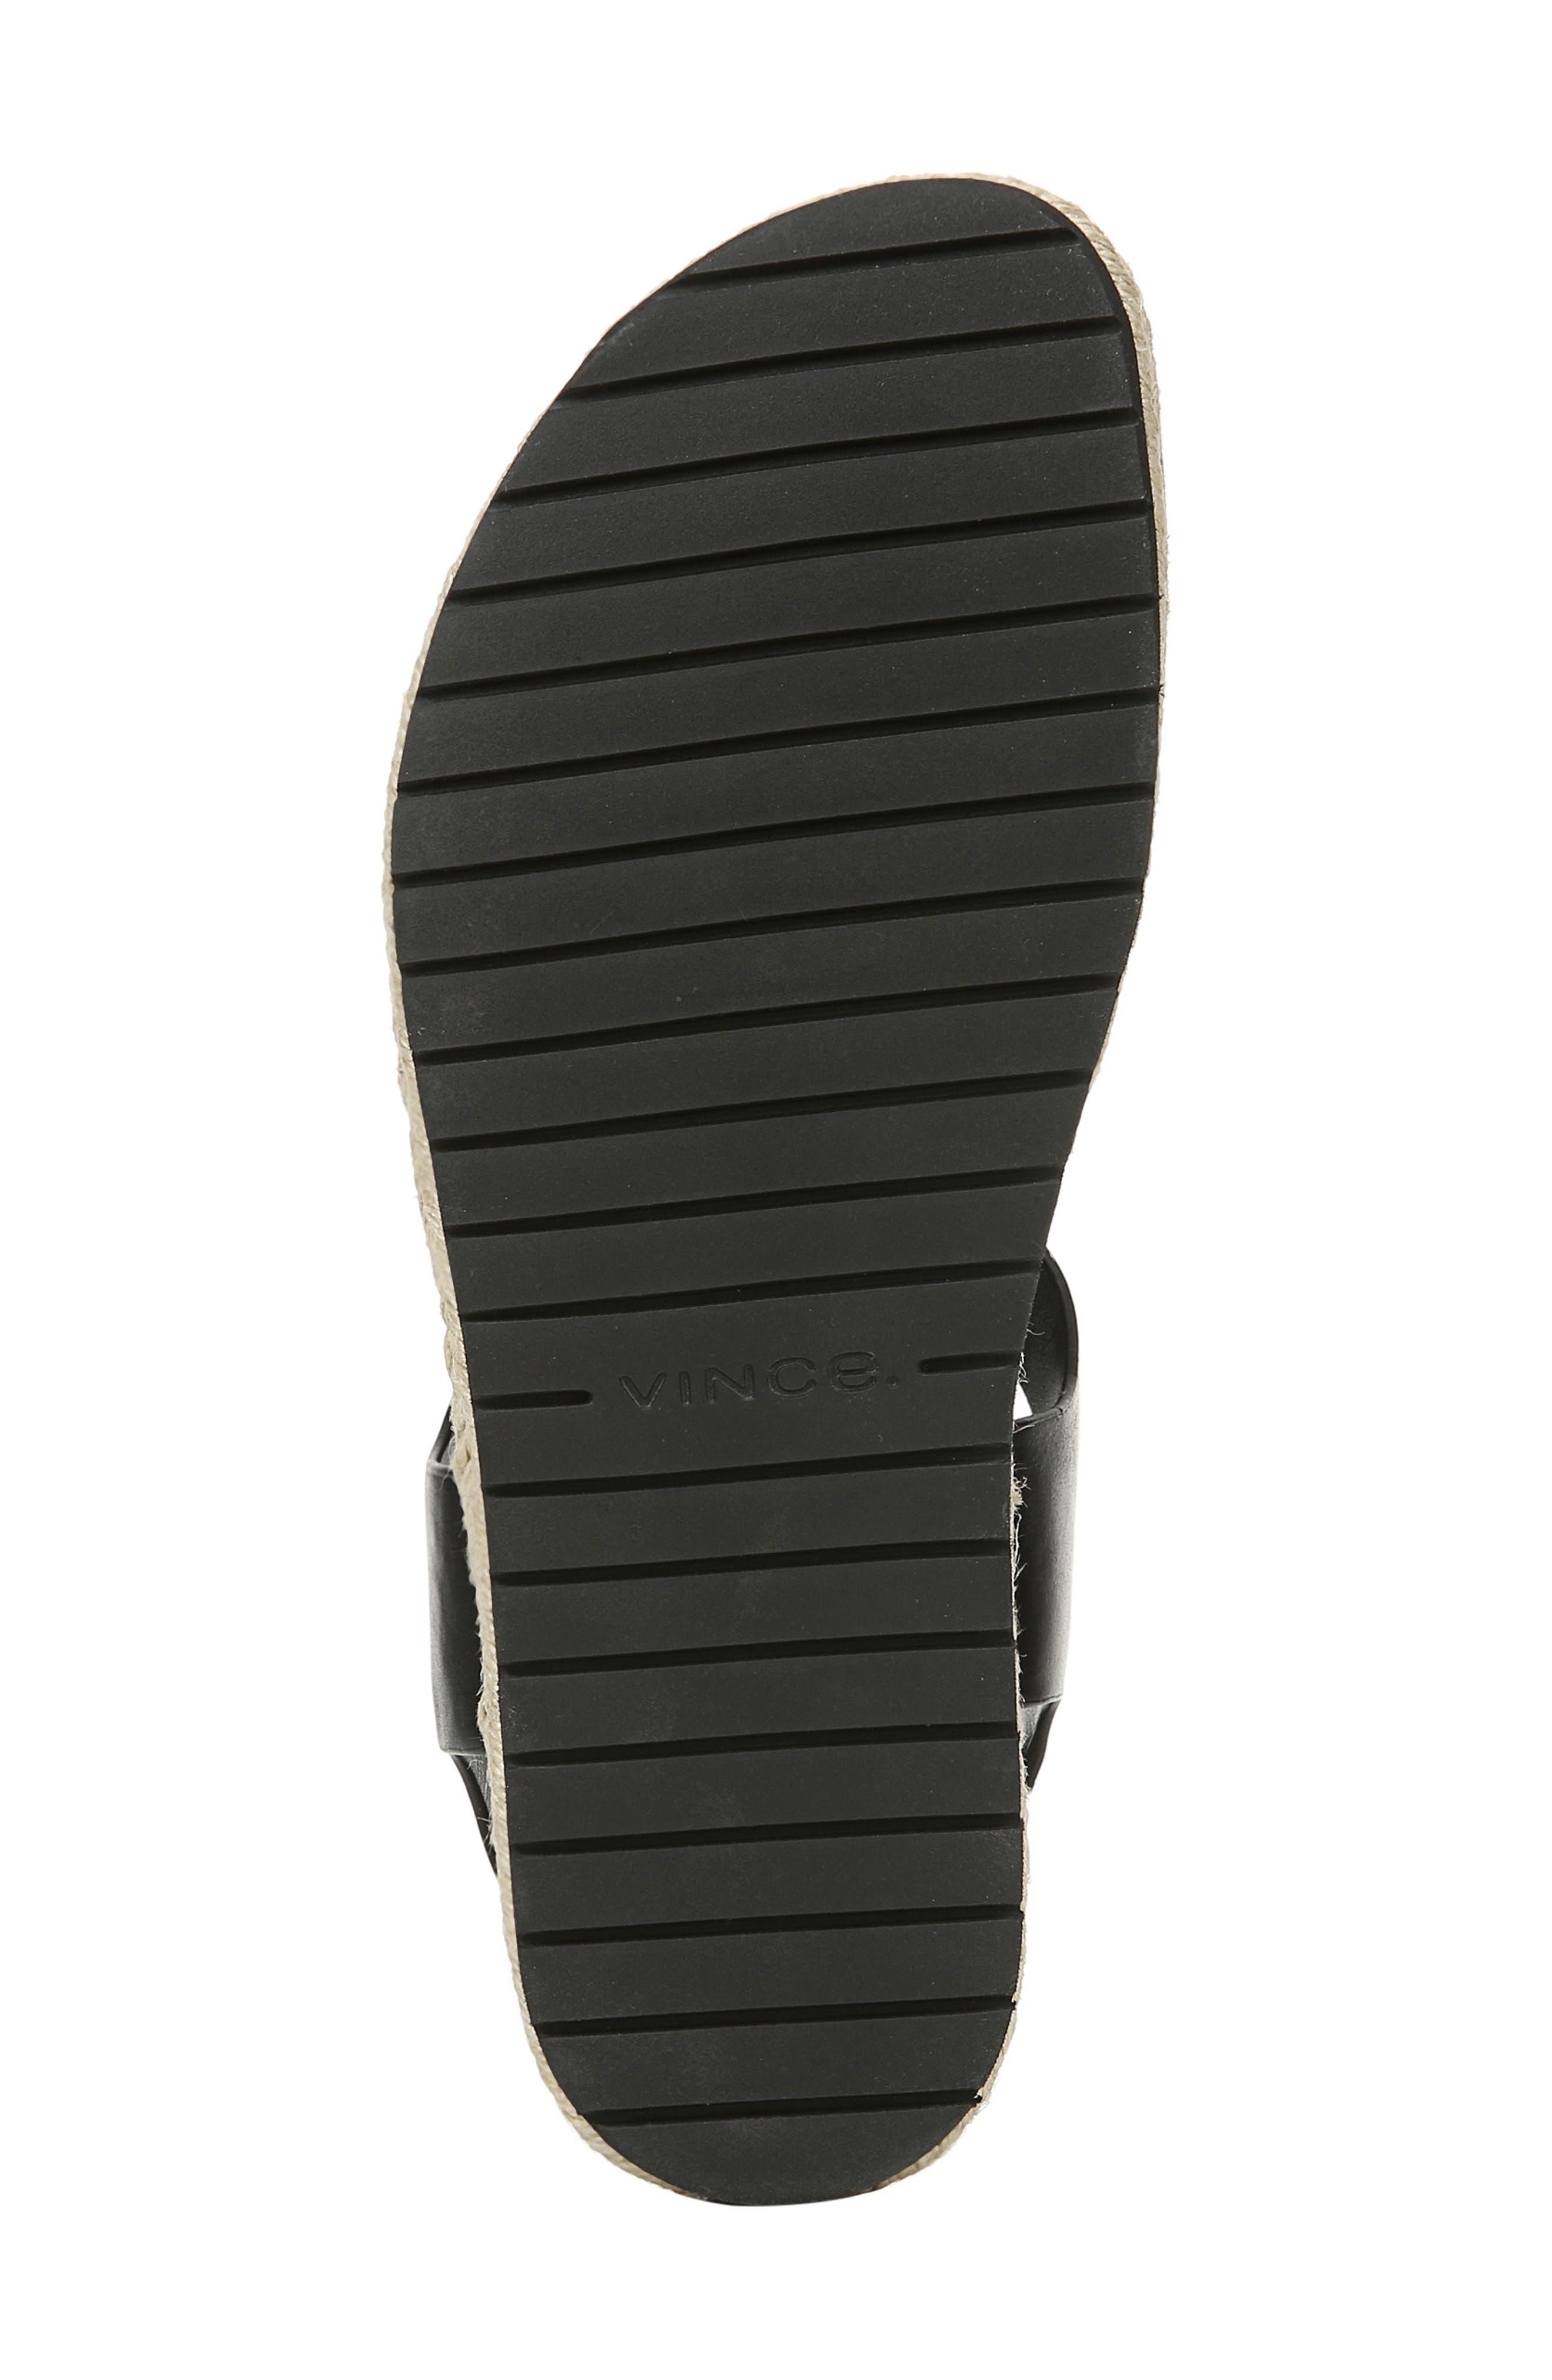 VINCE, Flint Espadrille Thong Sandal, Alternate thumbnail 6, color, BLACK